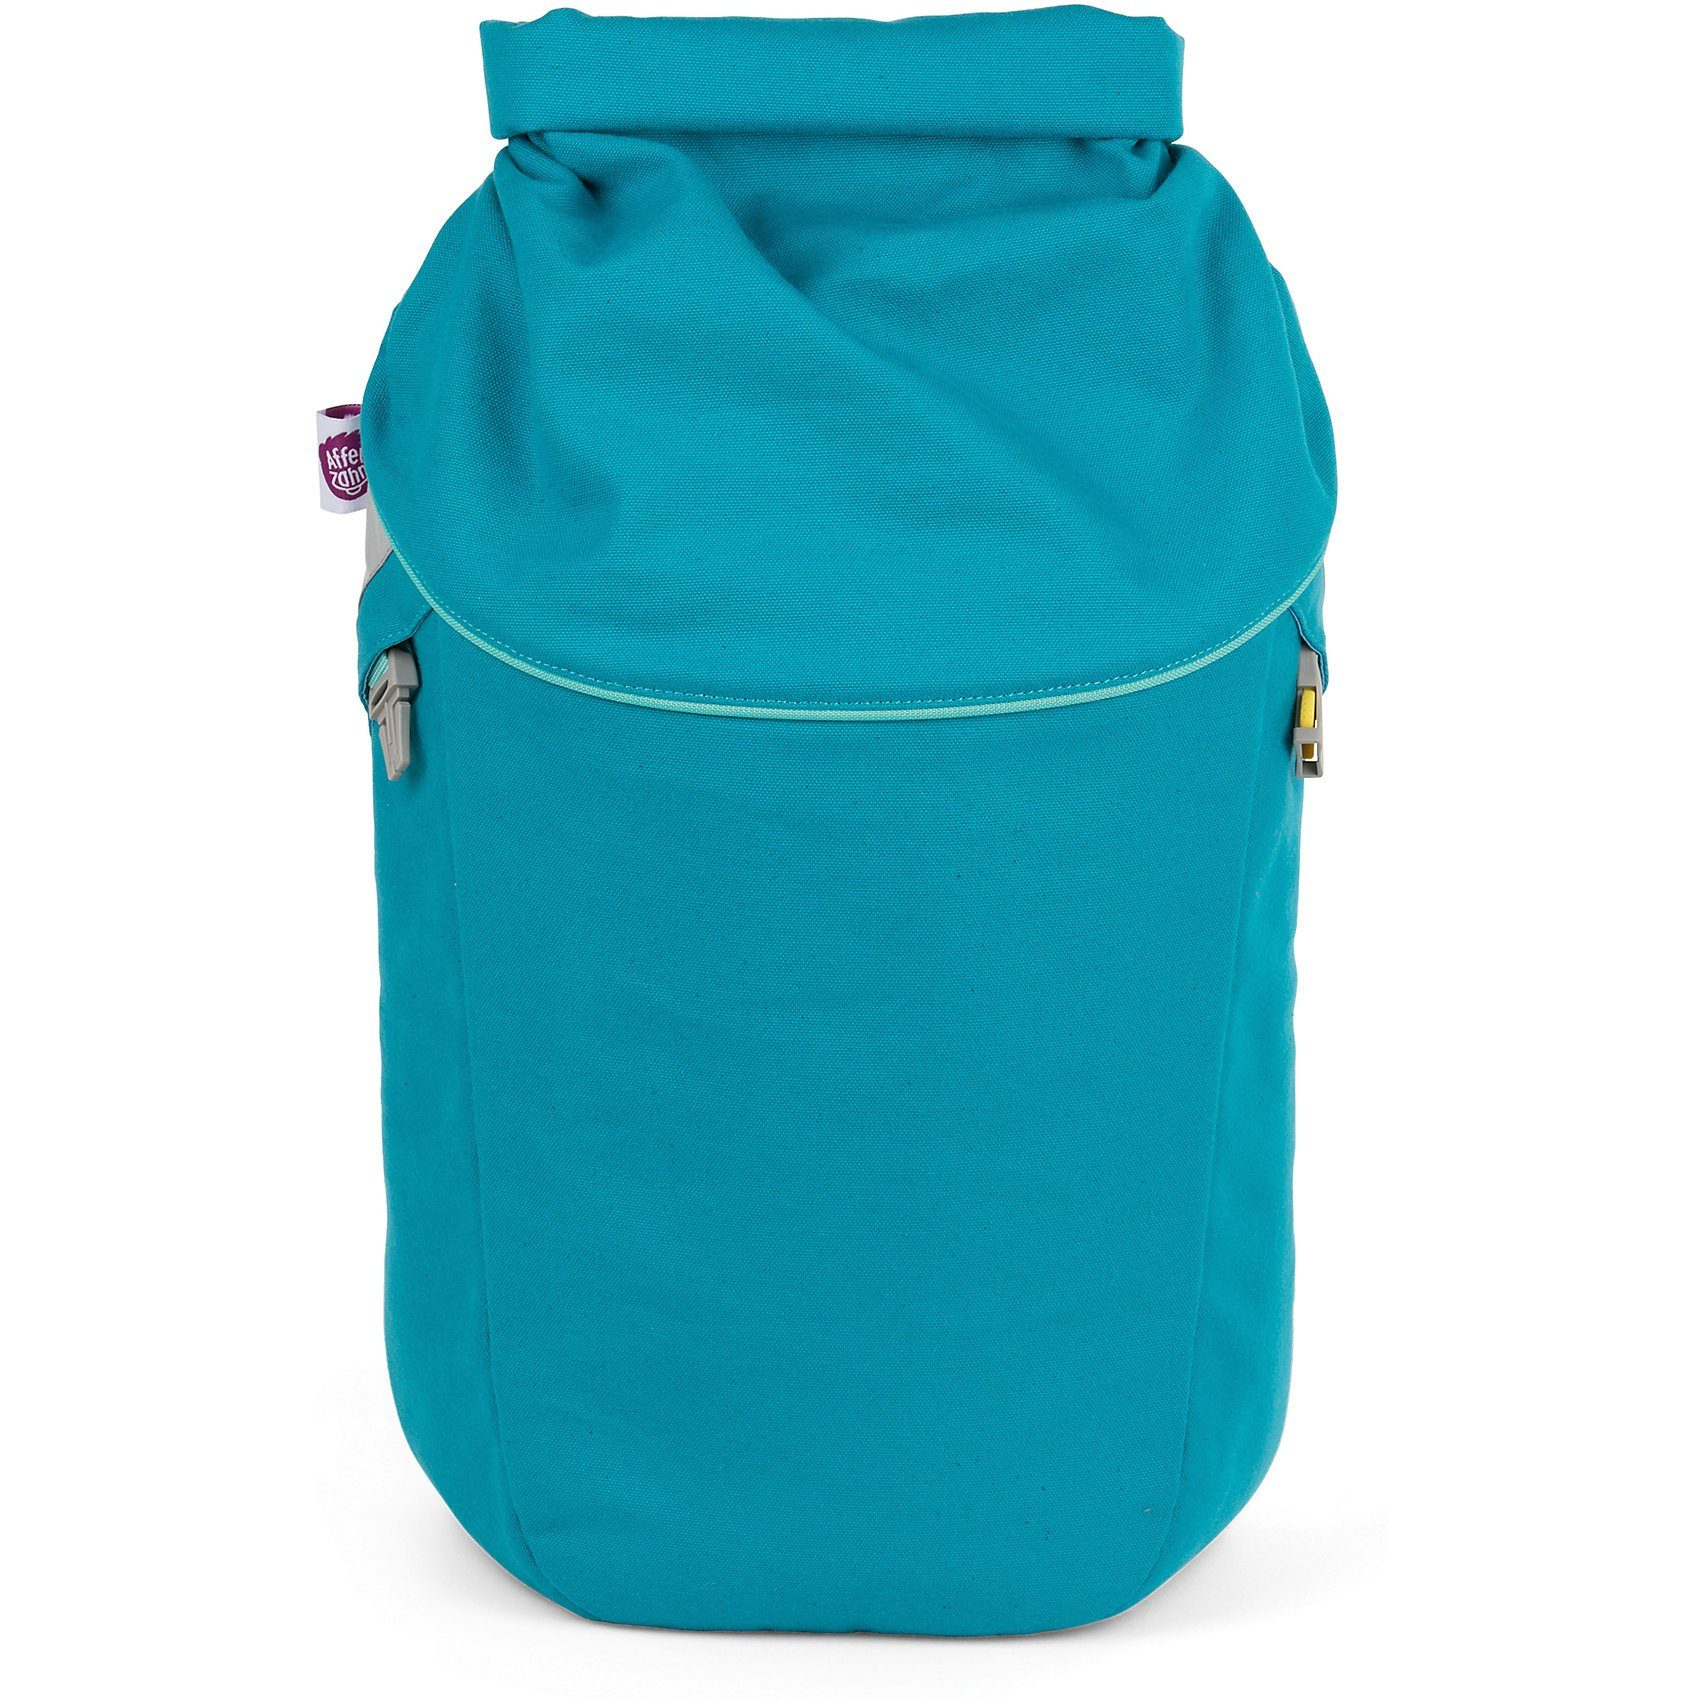 Affenzahn Kinderrucksack-Elternrucksack/Parents Bag, Petrol